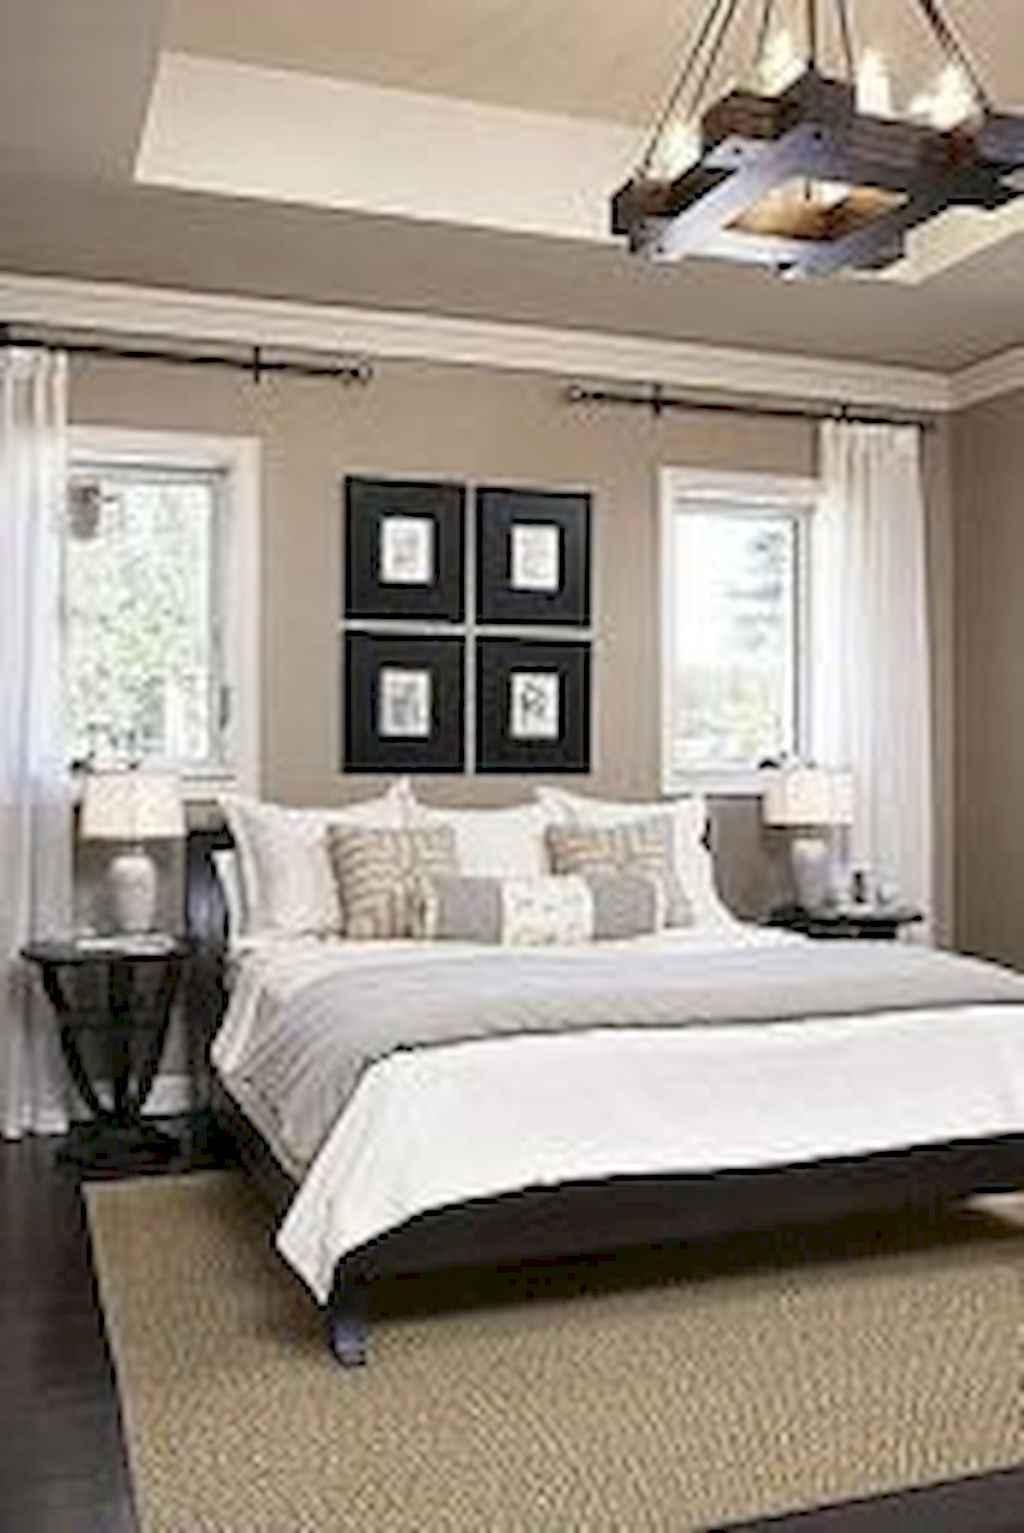 Incredible master bedroom ideas (59)